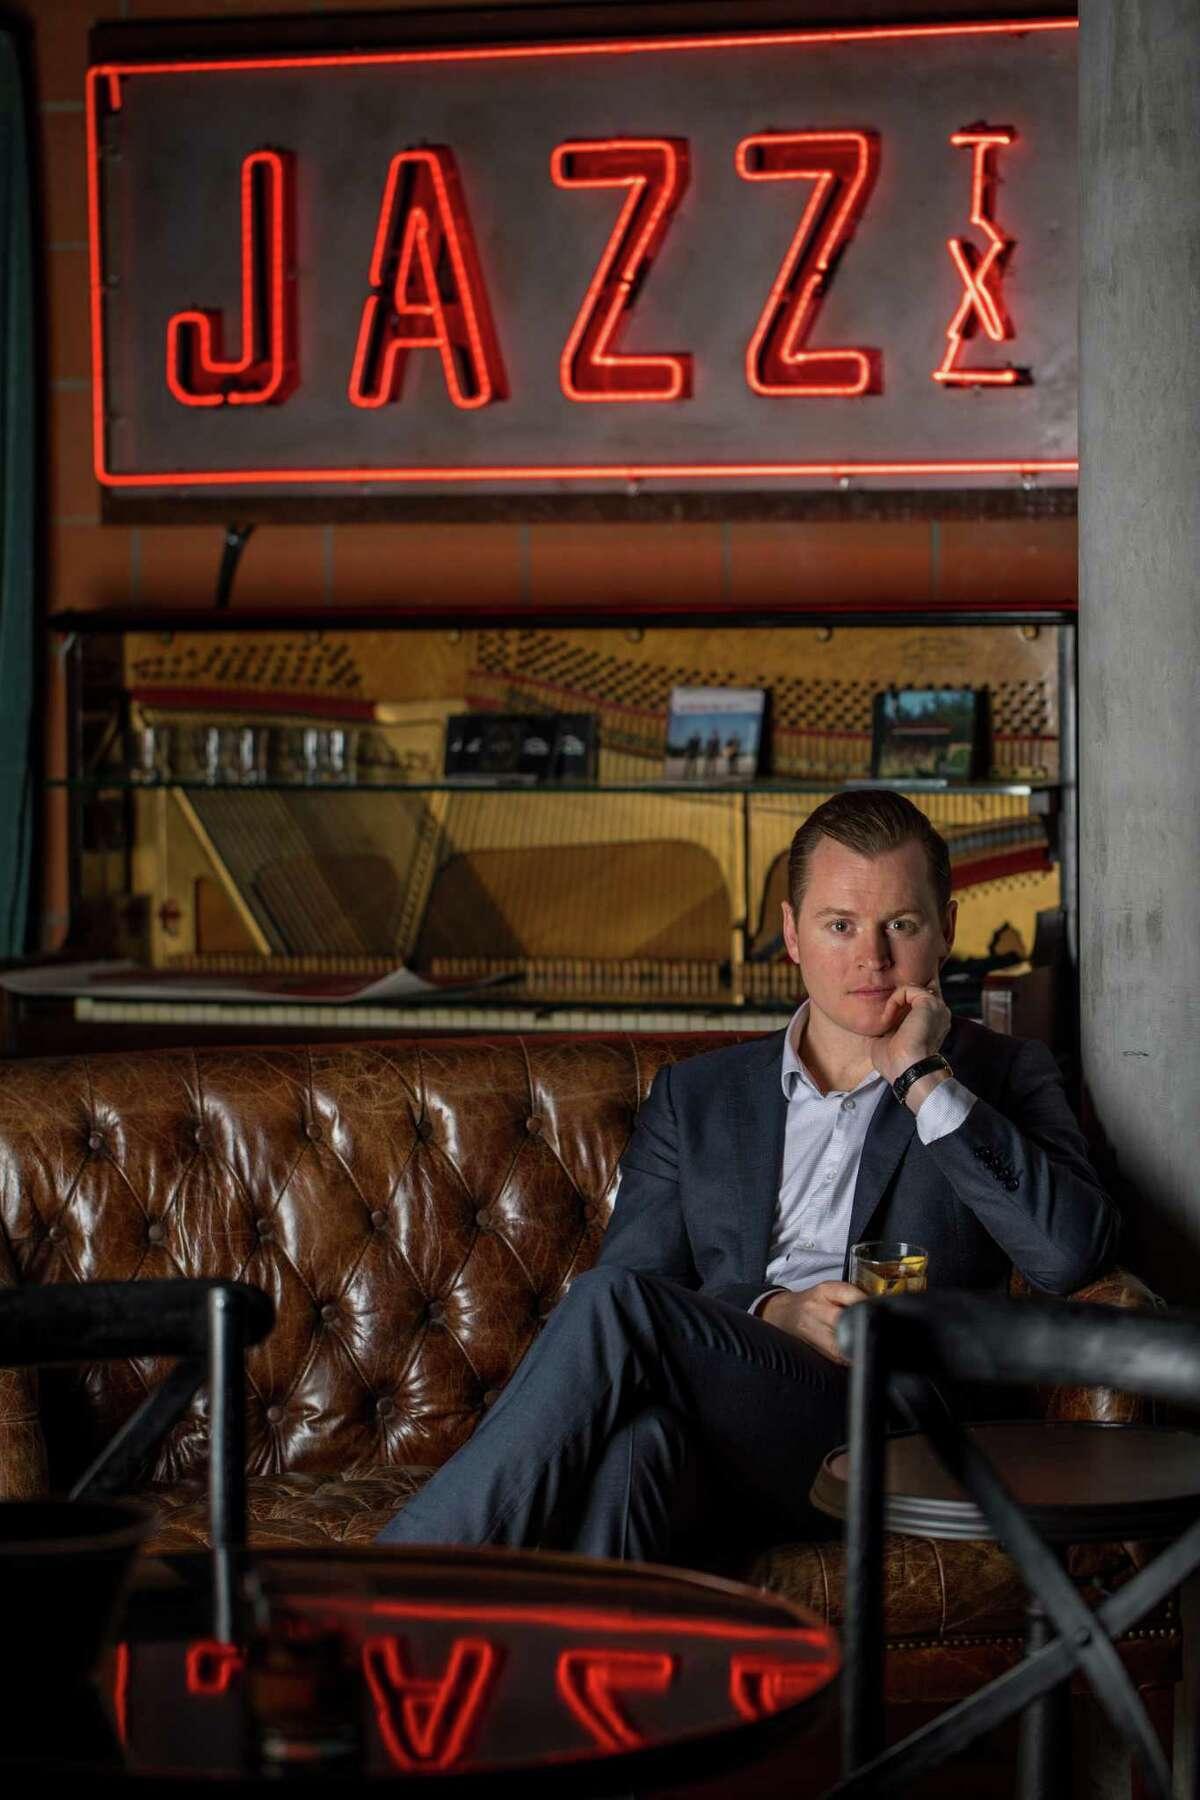 Jazz musician Doc Watkins owns Jazz, TX, a jazz club at The Pearl.